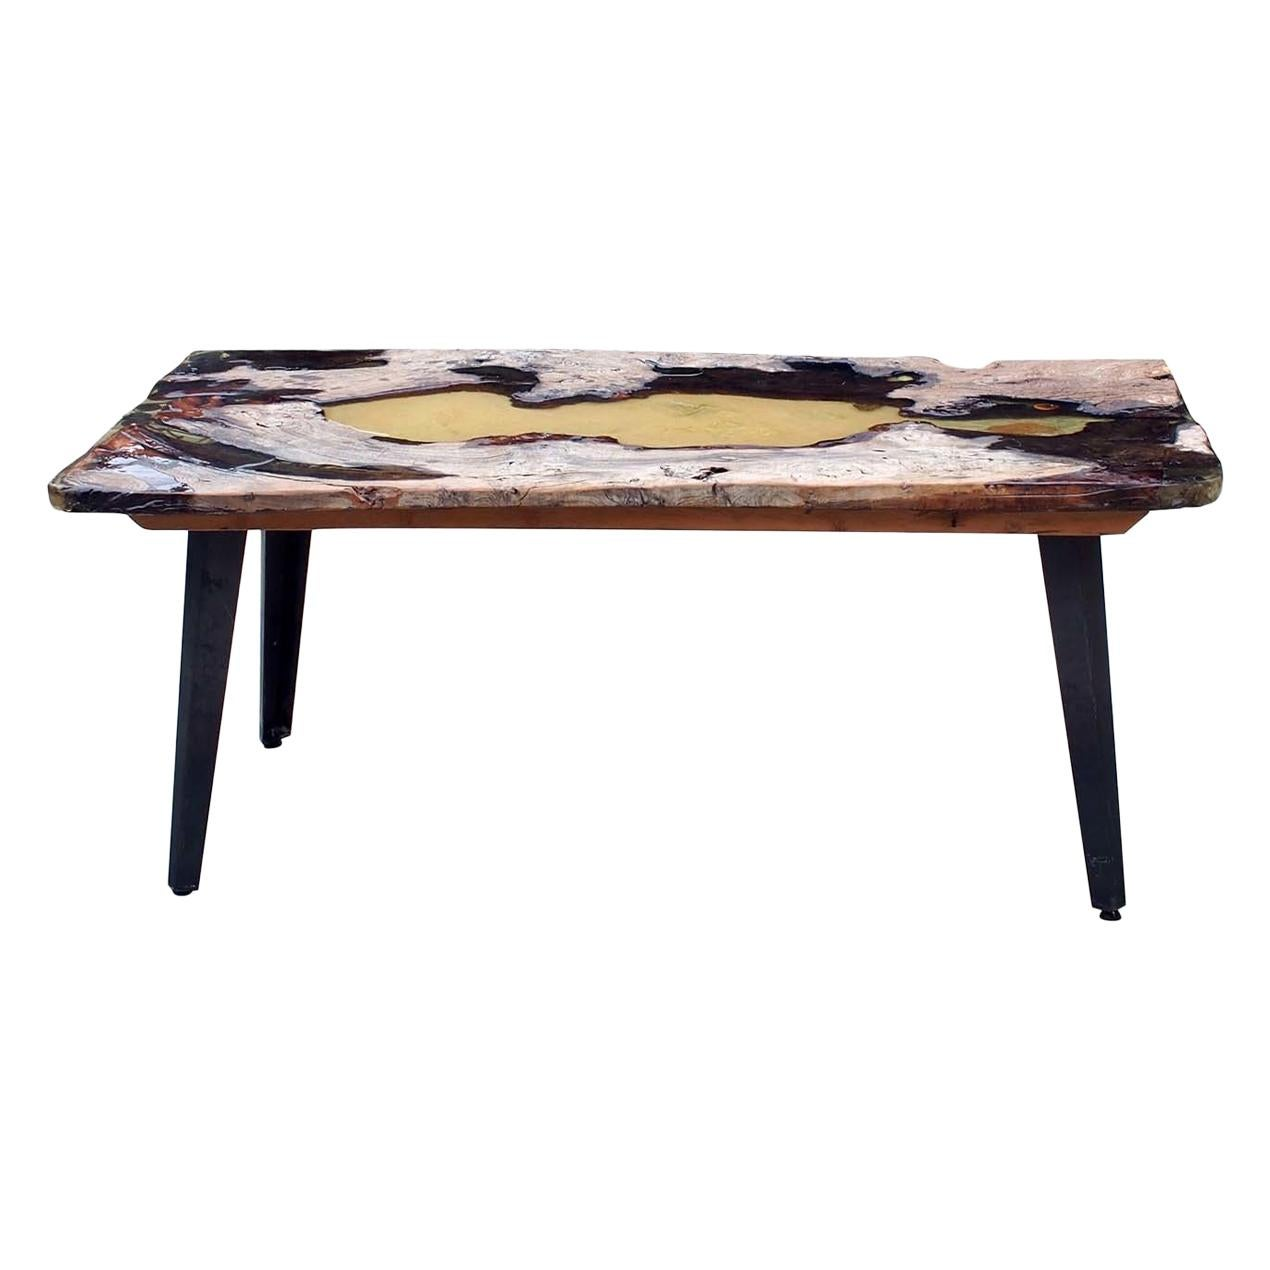 Moon Table in Ancient Elmwood